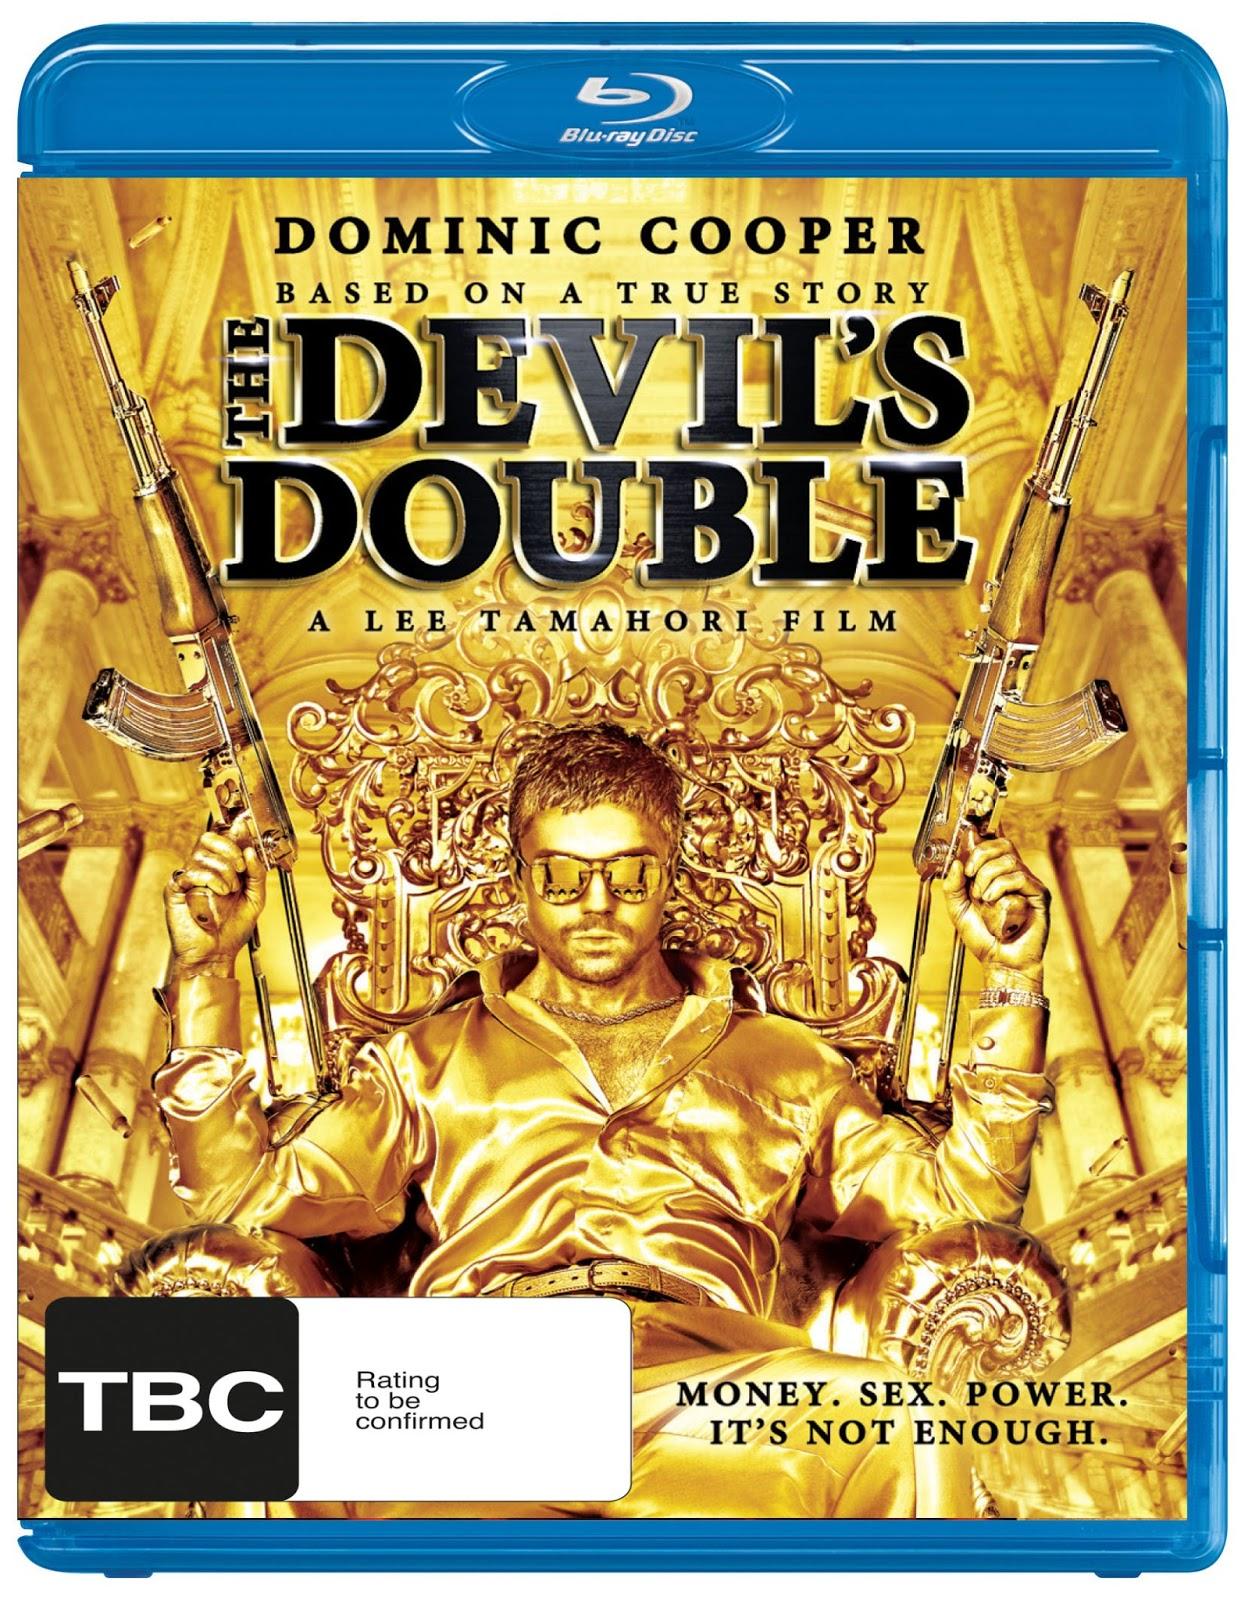 The DevilS Double